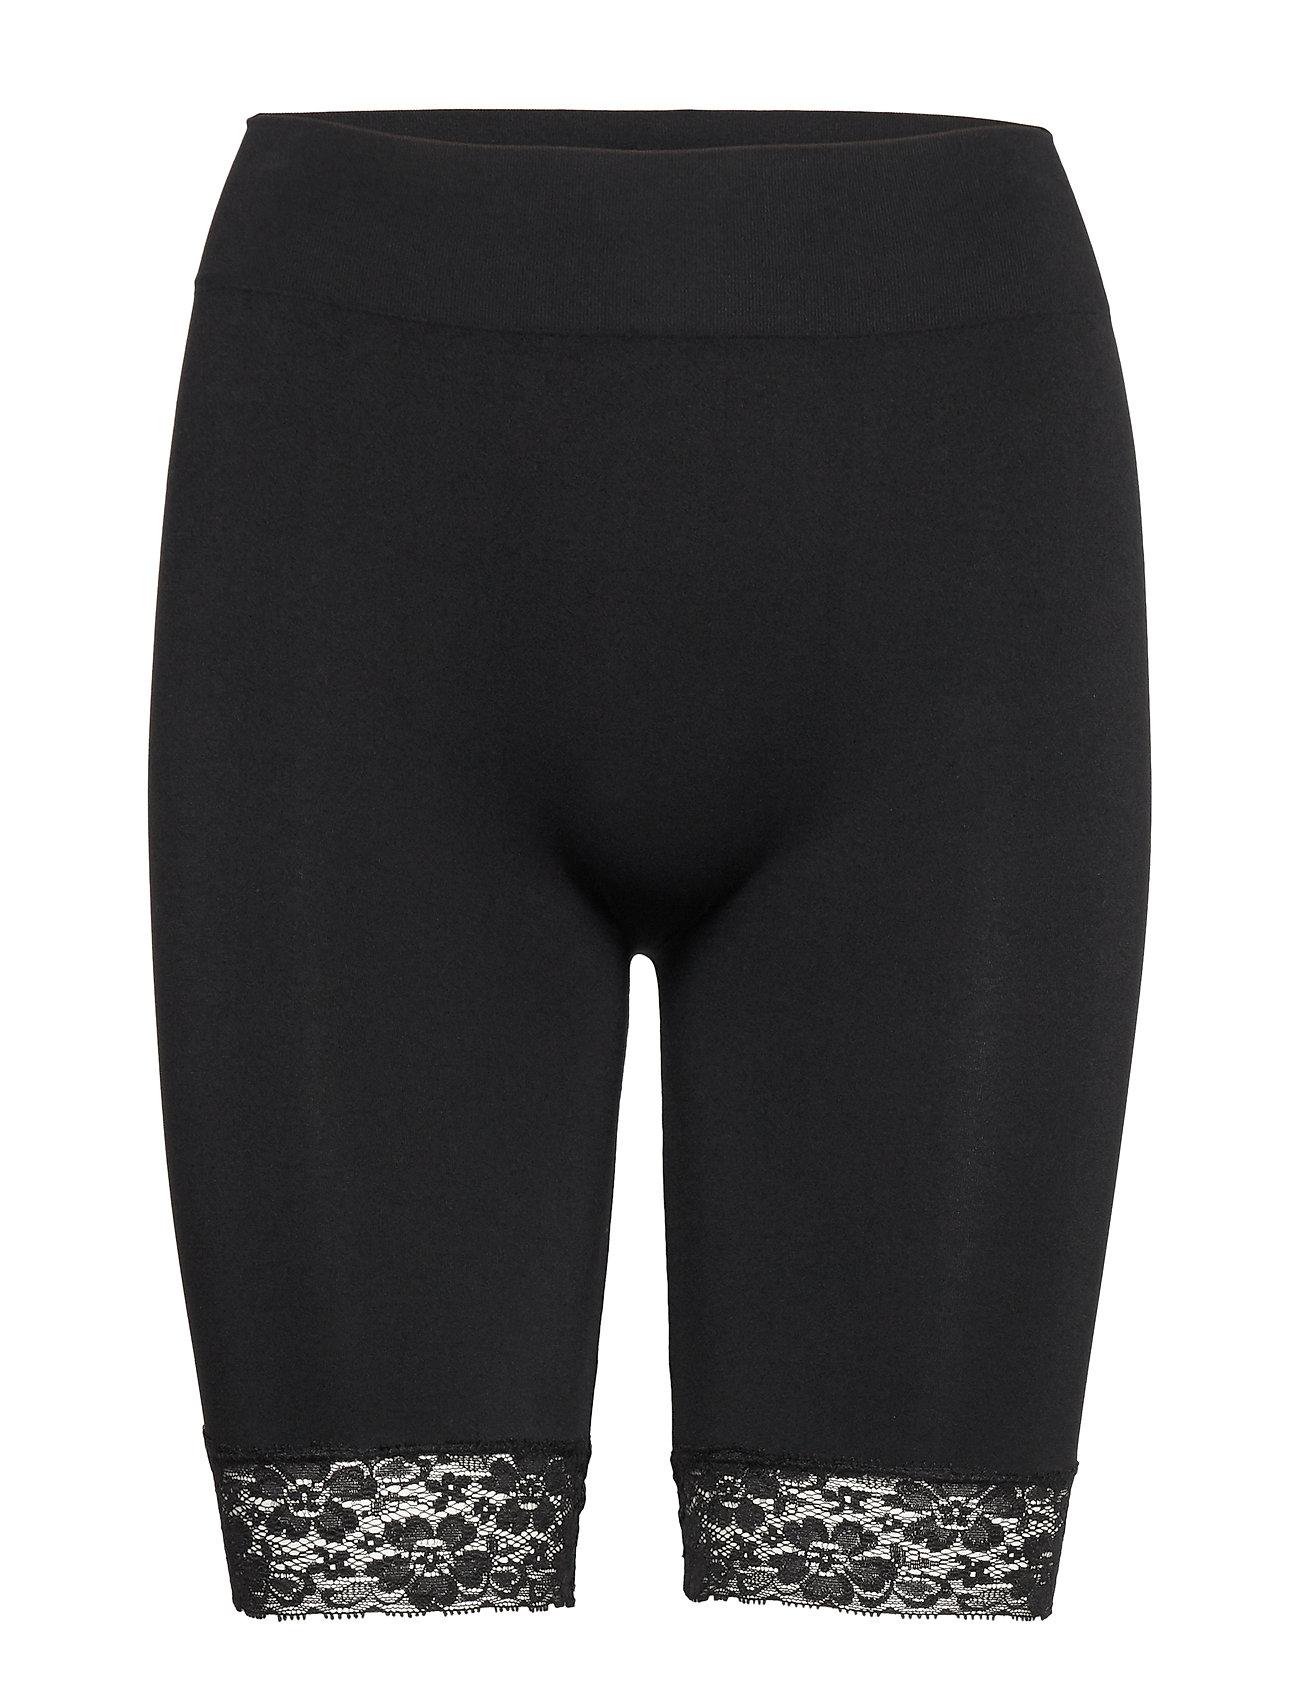 Decoy DECOY long shorts w/lace - BLACK